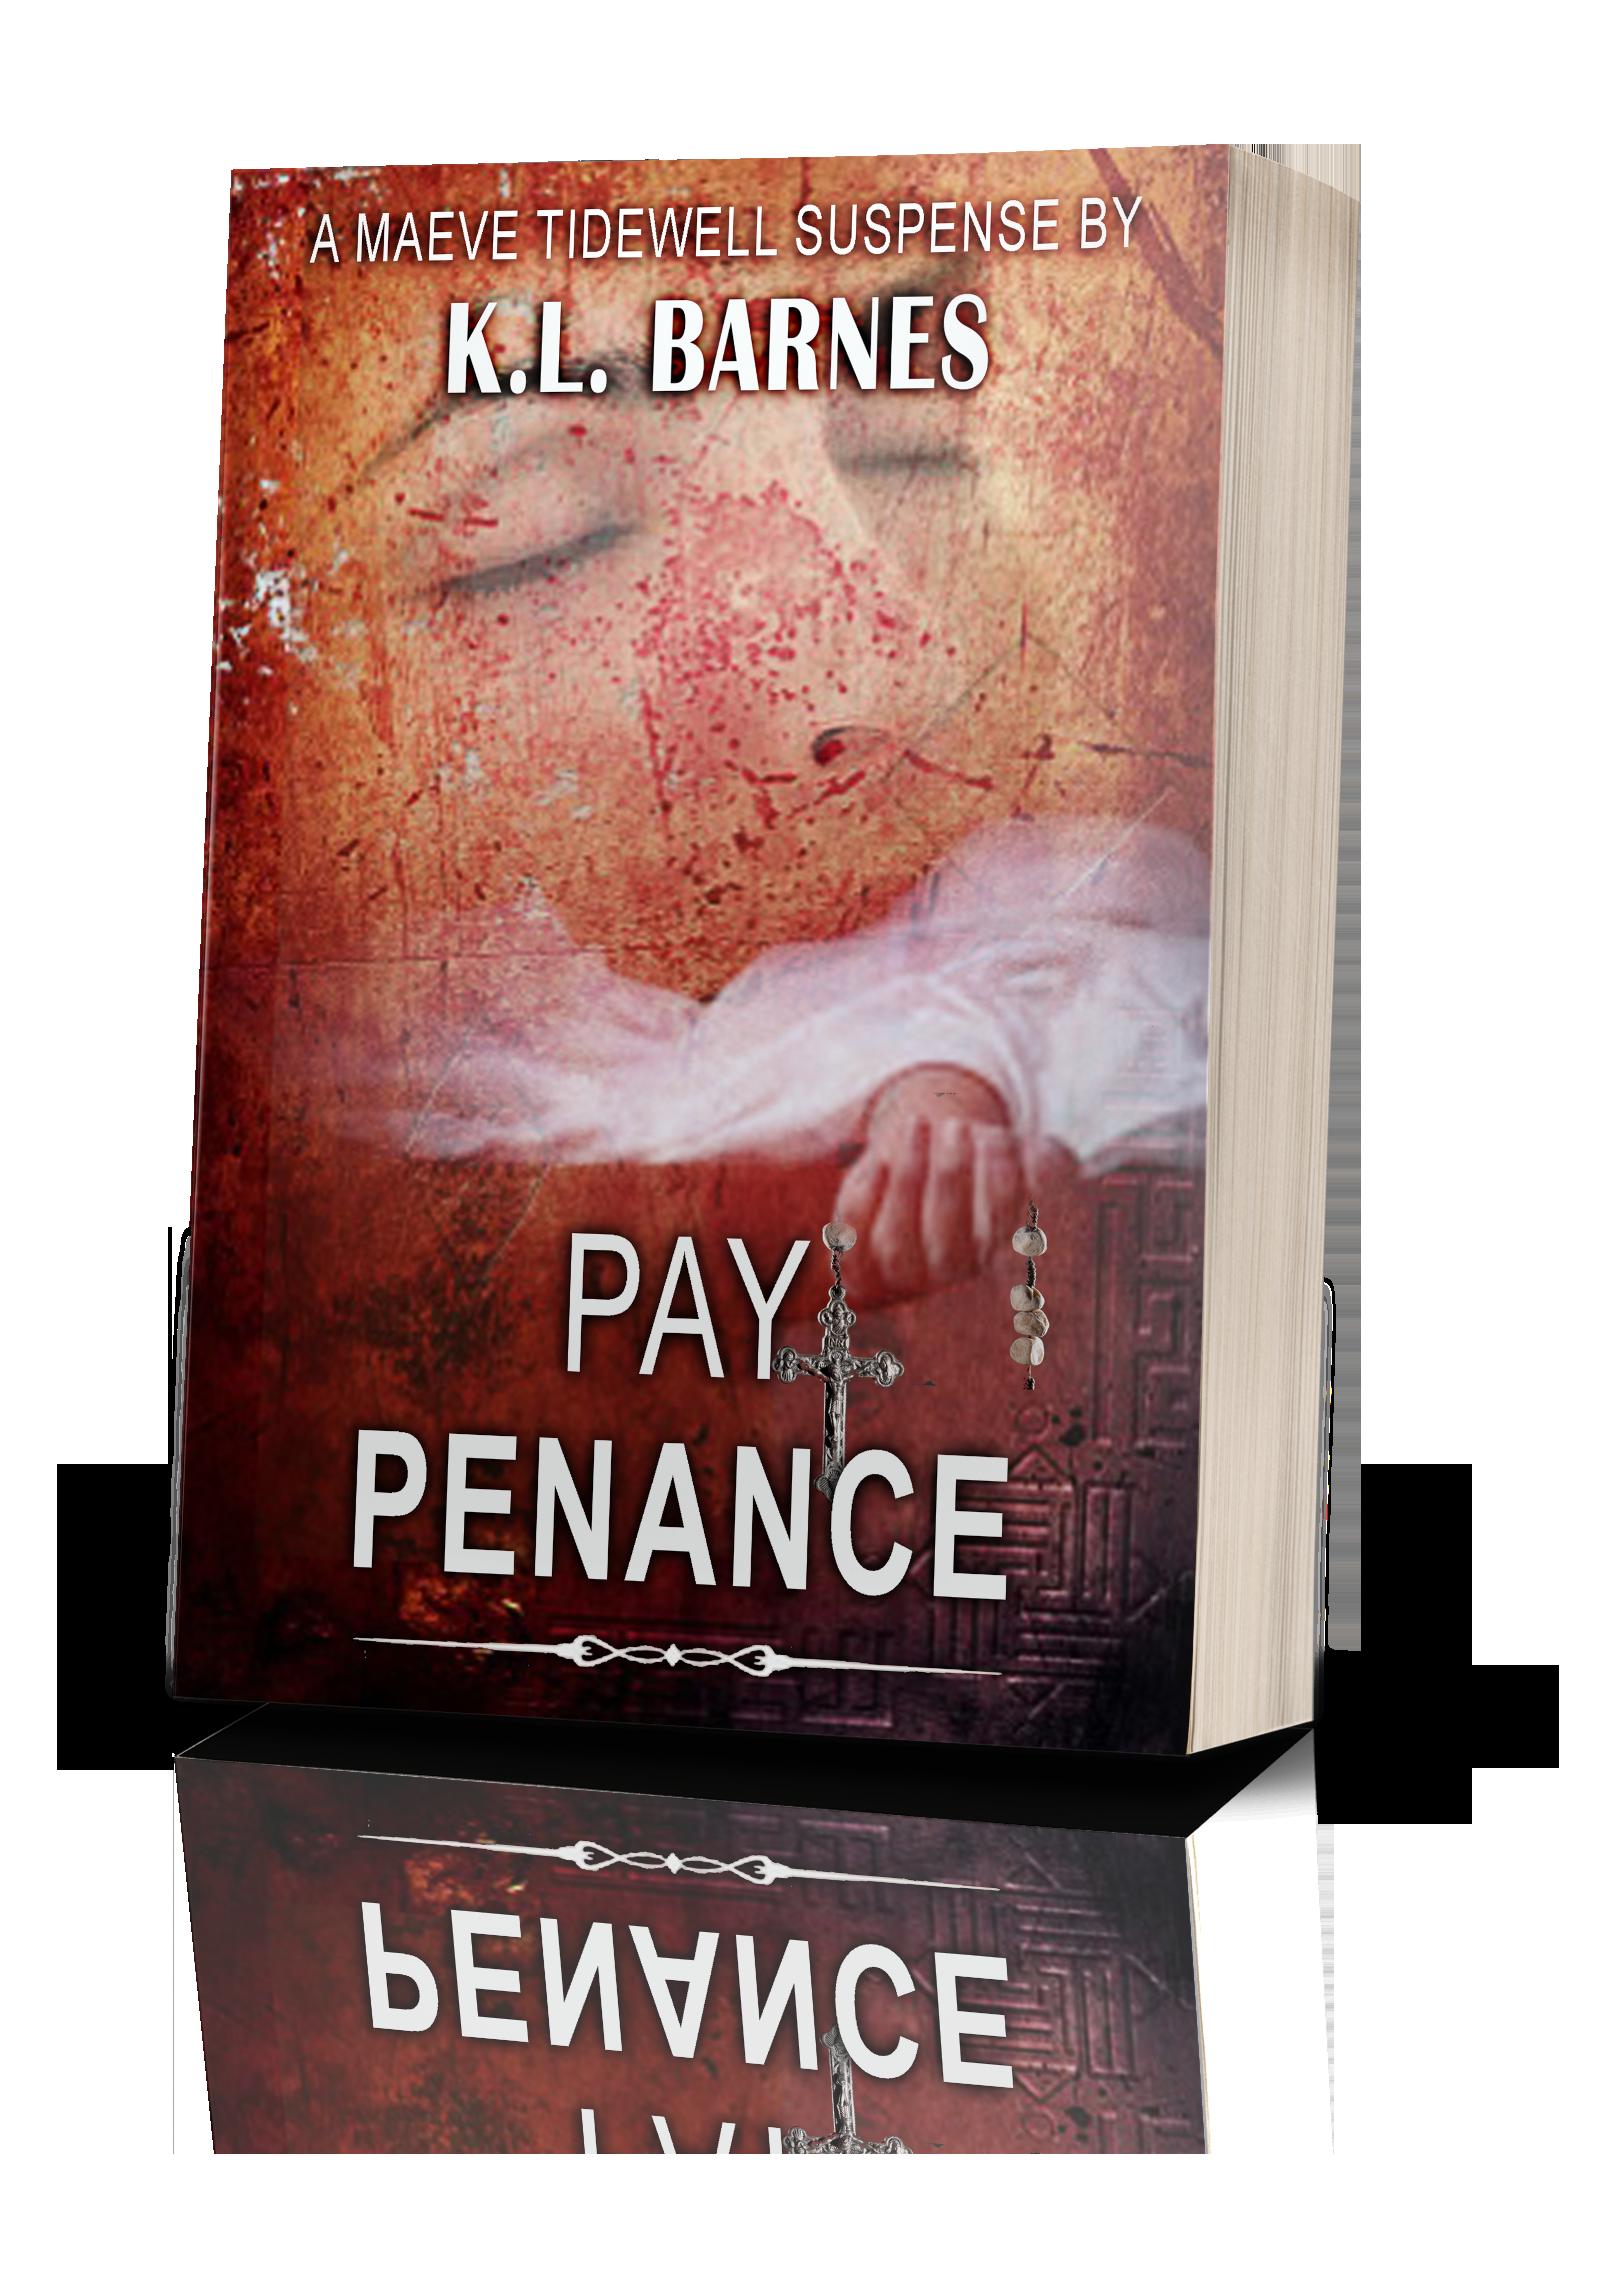 Pay Penance